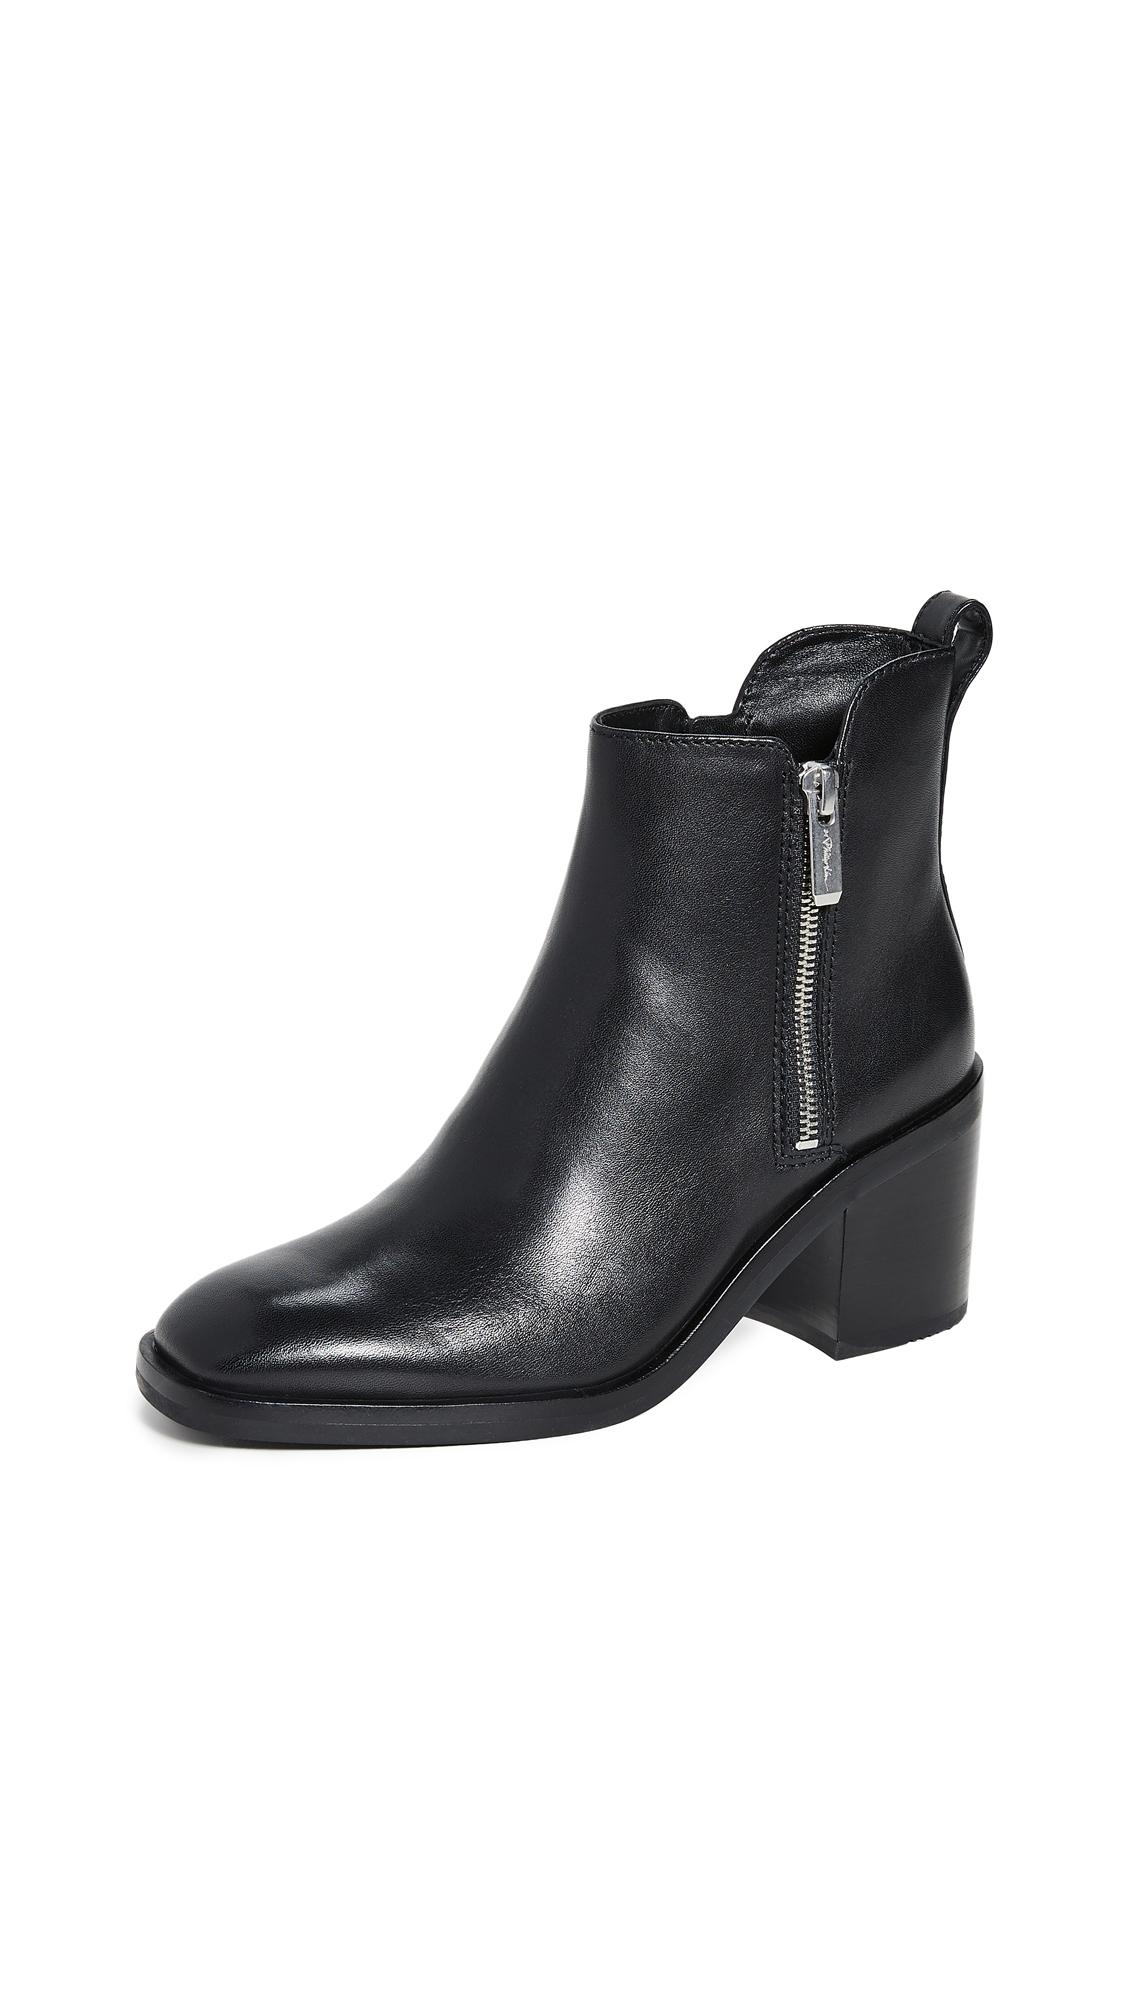 Buy 3.1 Phillip Lim Alexa 70mm Boots online, shop 3.1 Phillip Lim